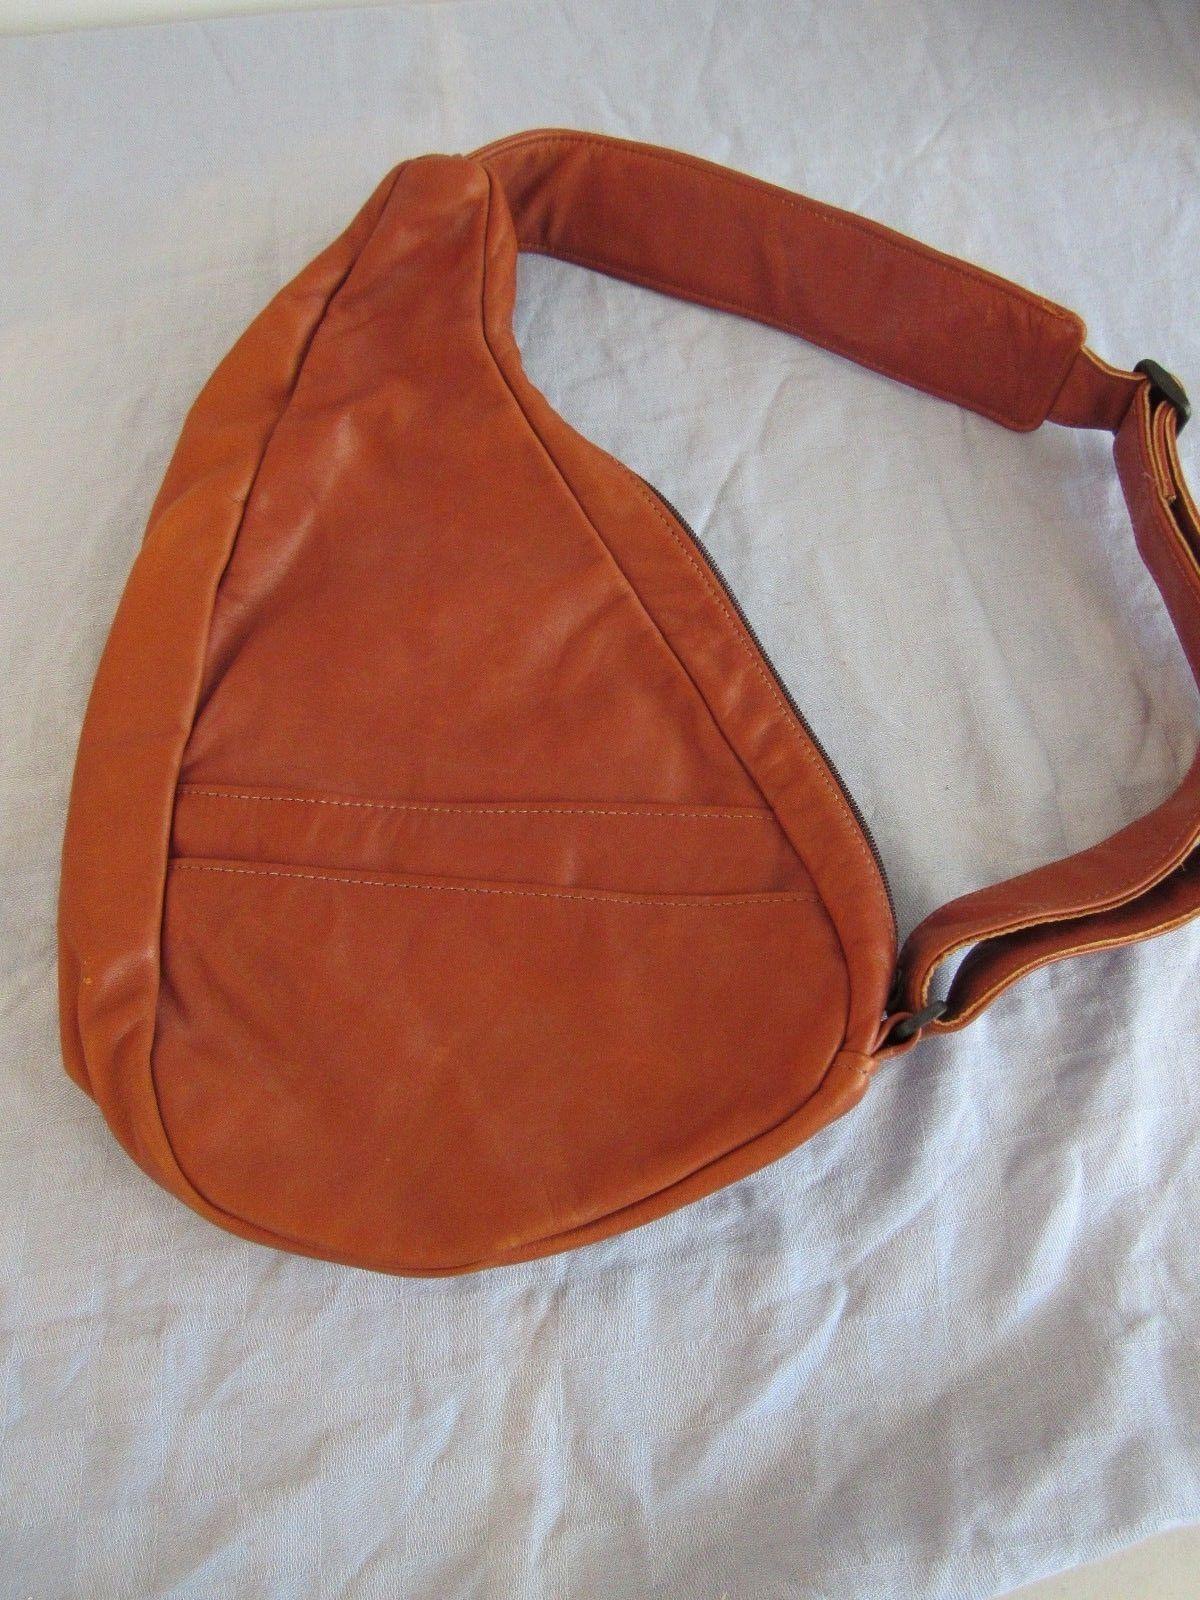 AmeriBag Healthy Back Bag Nylon Sling Bag Brown Leather